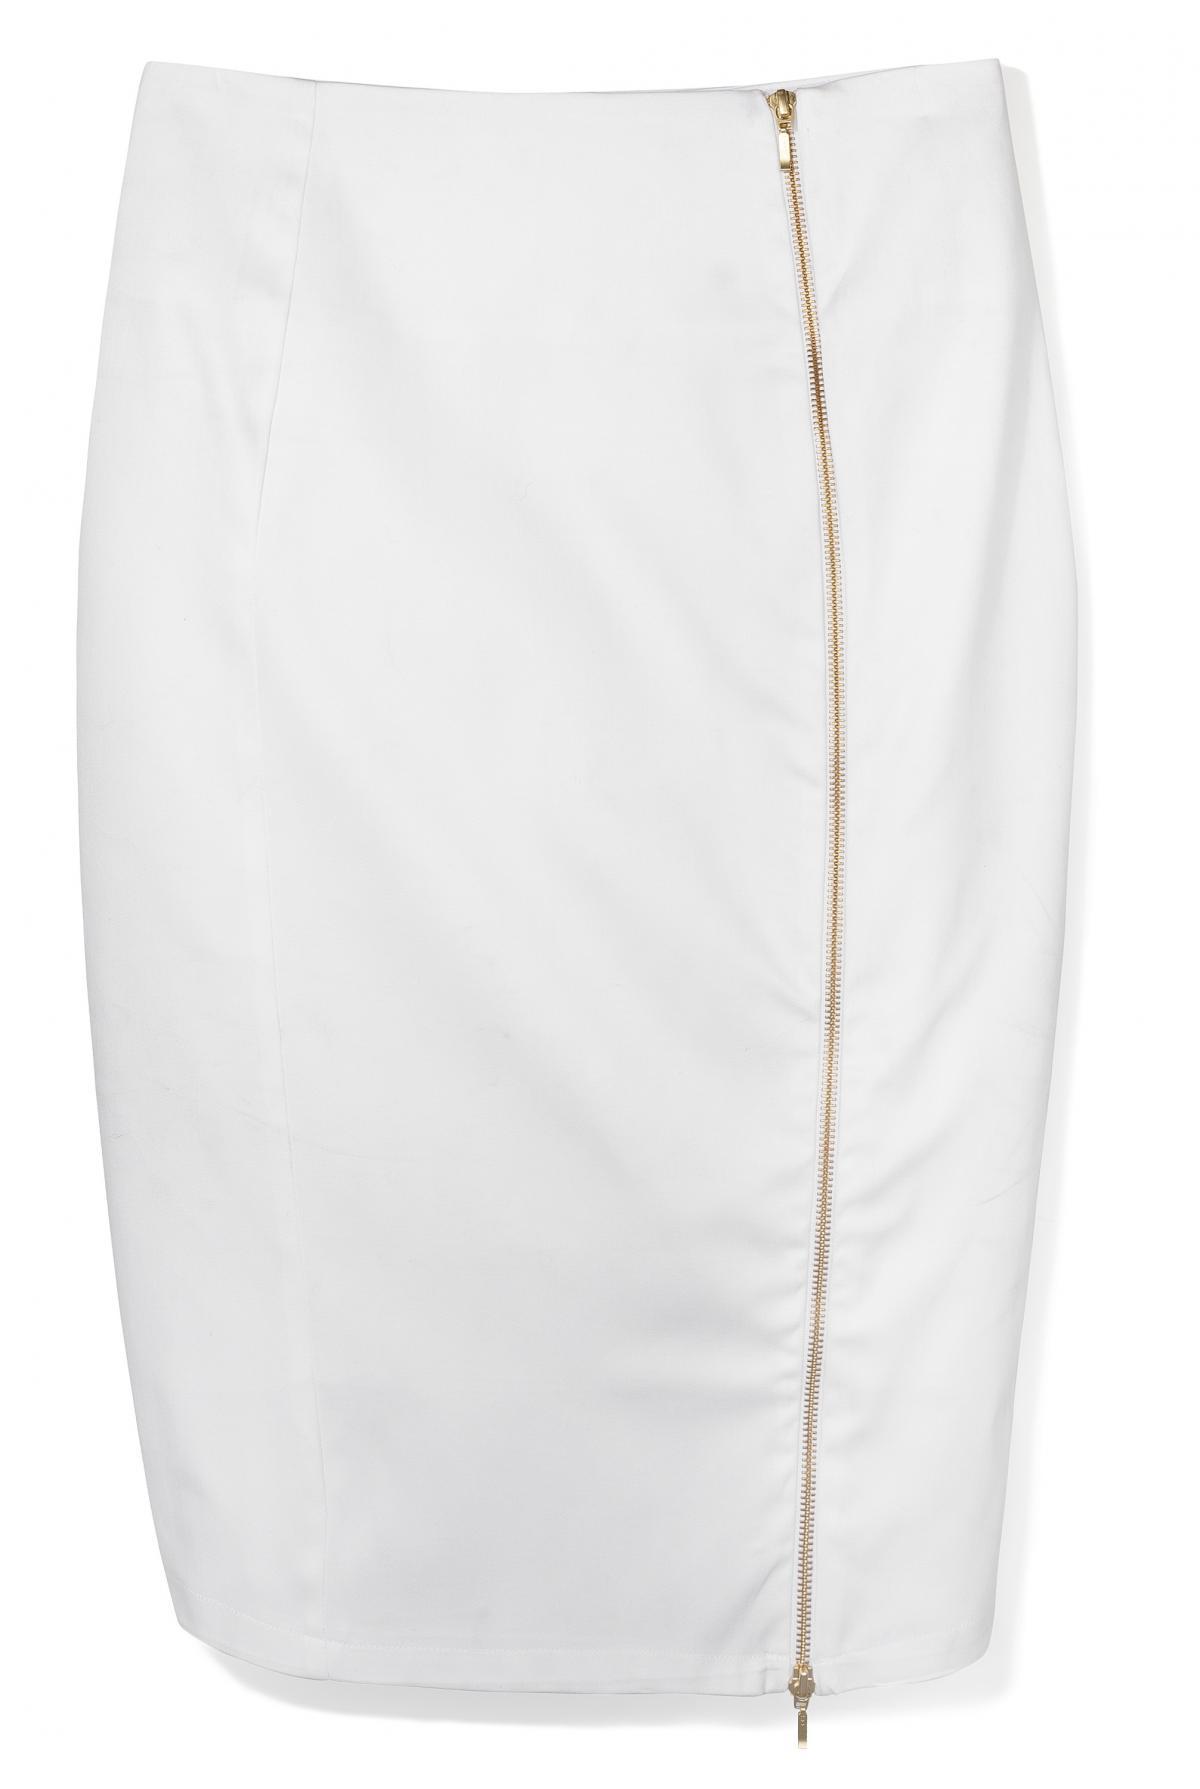 Kolekcja Mohito na wiosnę i lato 2012 - sukienki i spódnice